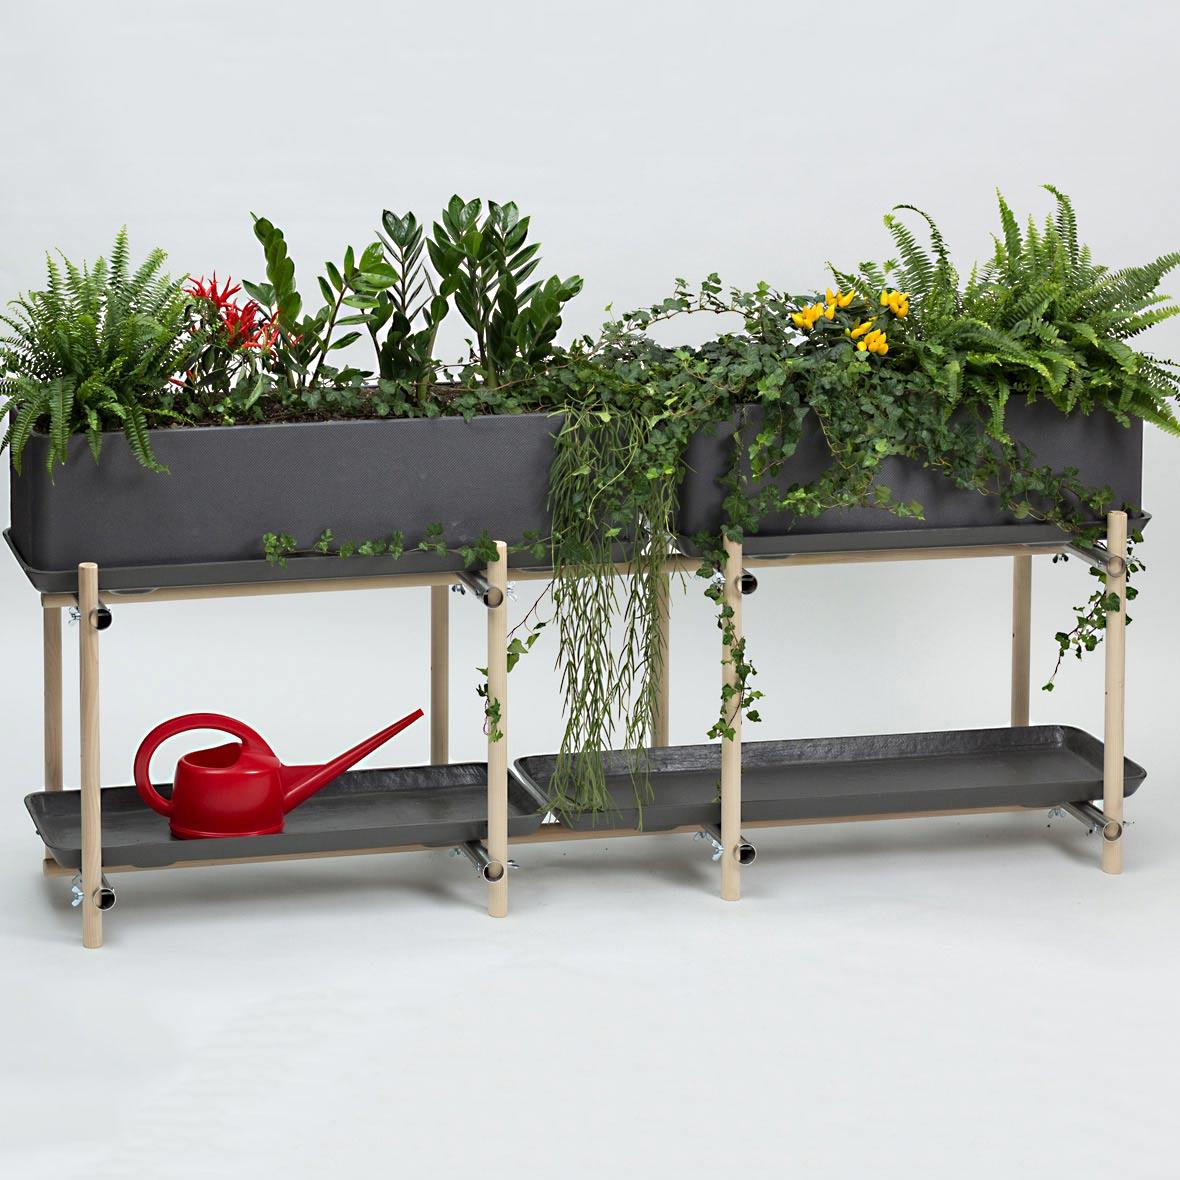 Pflanzenregal Stelz horizontal